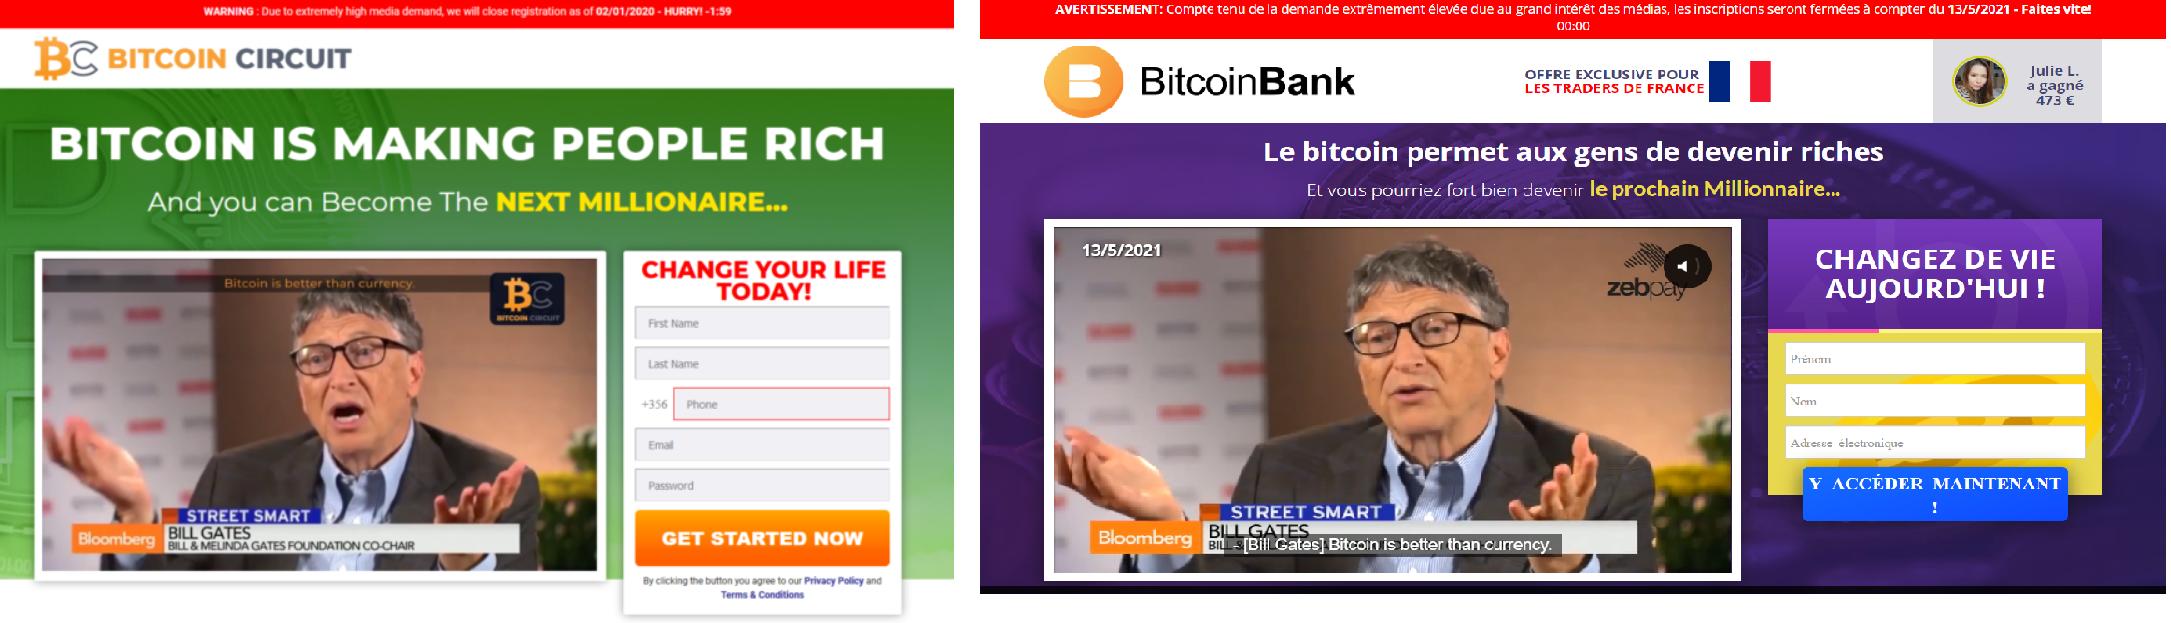 Bitcoin Circuit et Bitcoin Bank